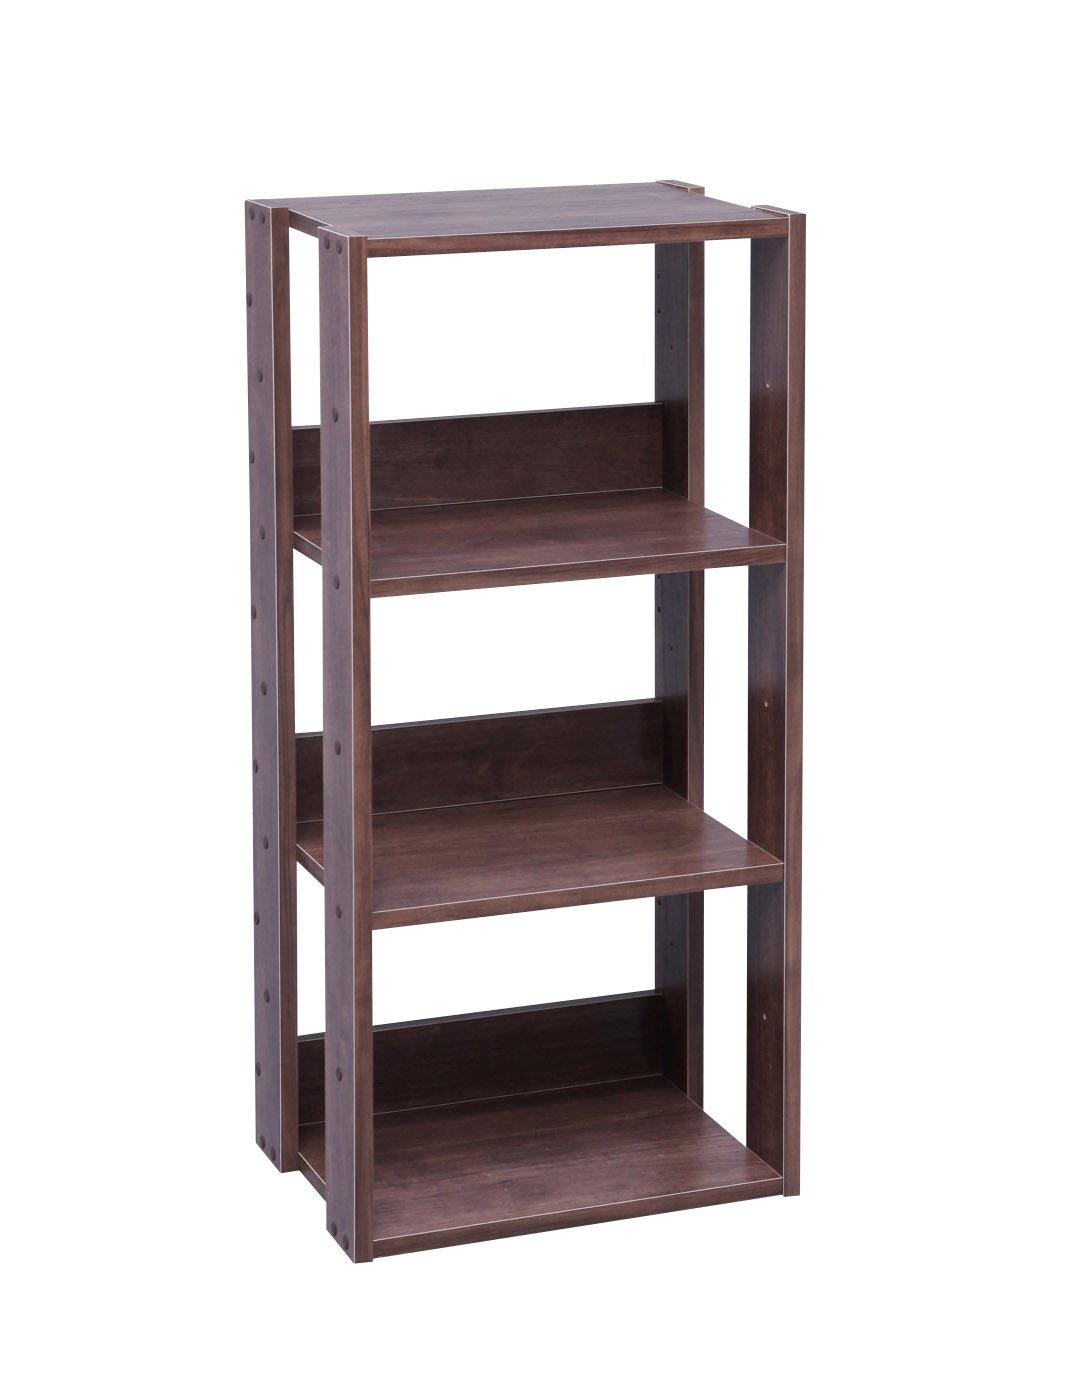 IRIS USA 3-Tier Open Wood Bookshelf, Dark Brown by IRIS USA, Inc.